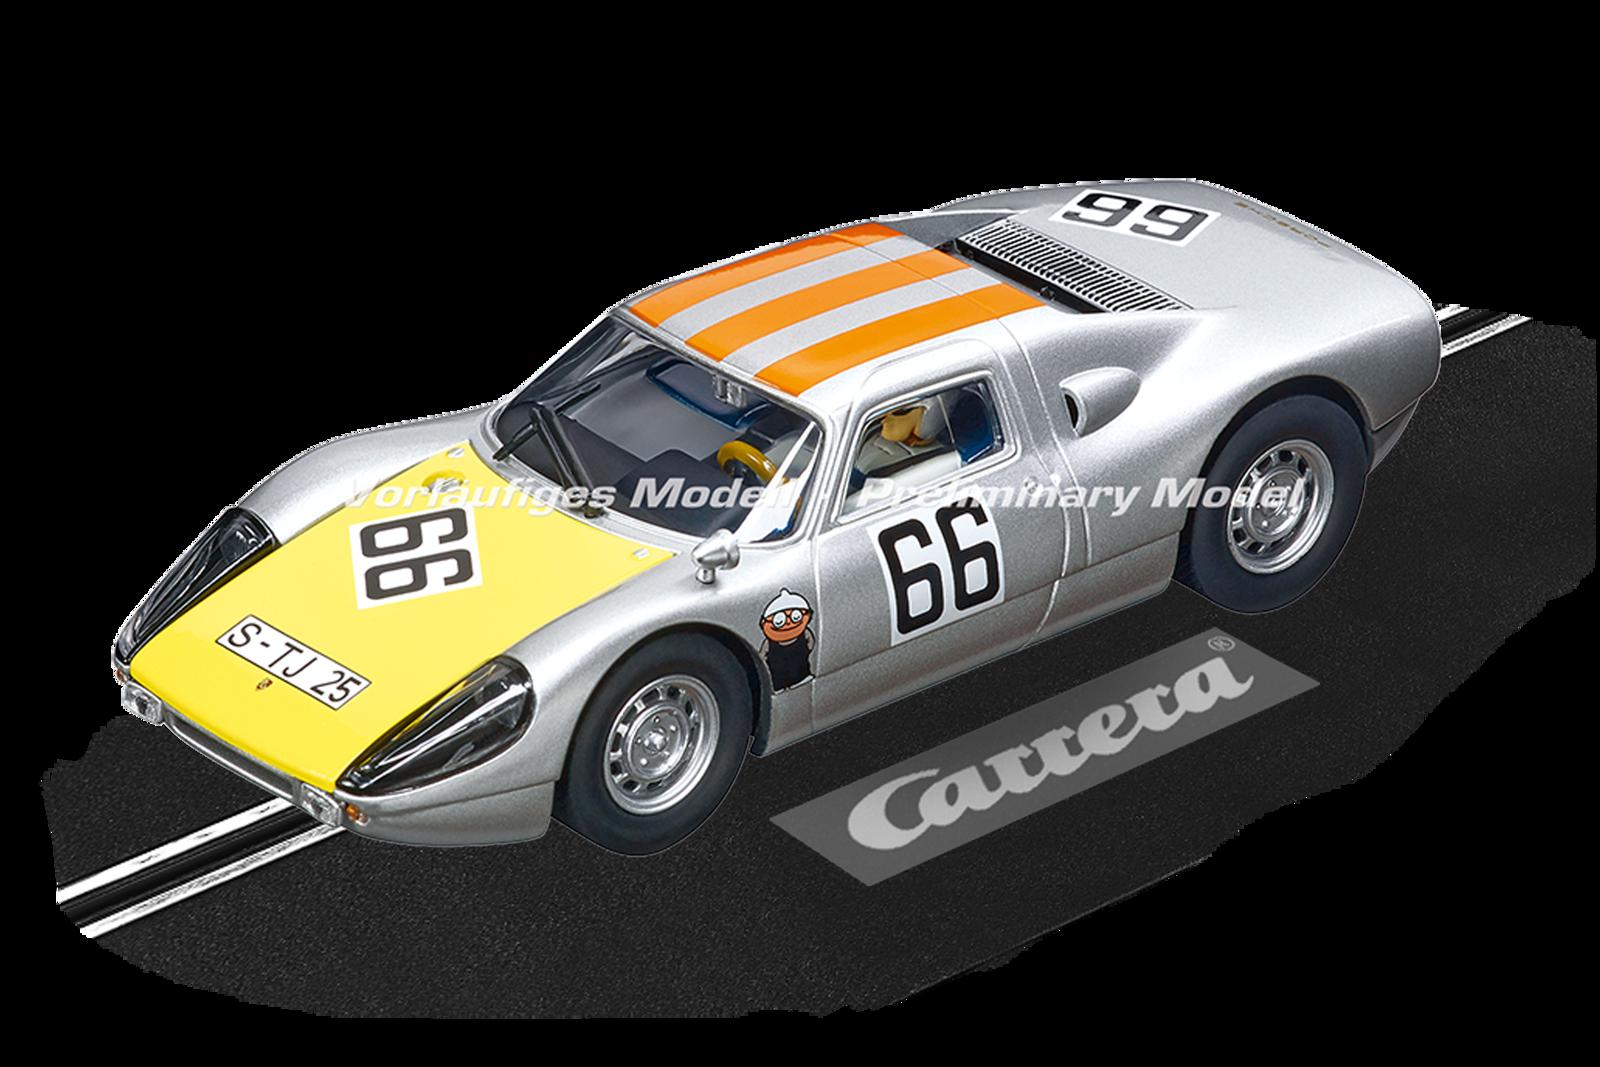 Porsche 904 Carrera GTS #66 (30902)